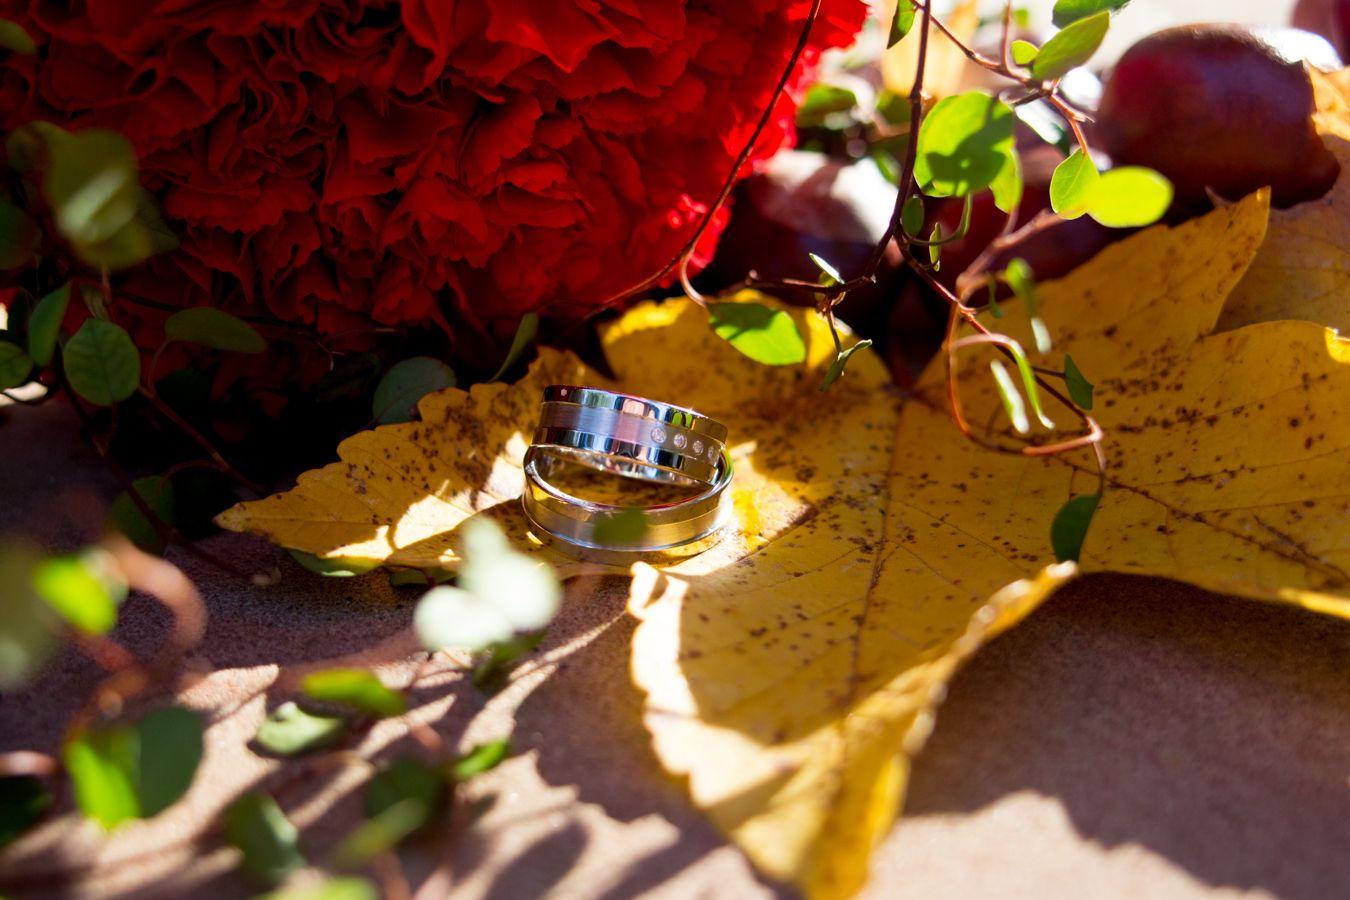 Hochzeitsfotograf 1.0 ‹ Kallidat – Quality Photography